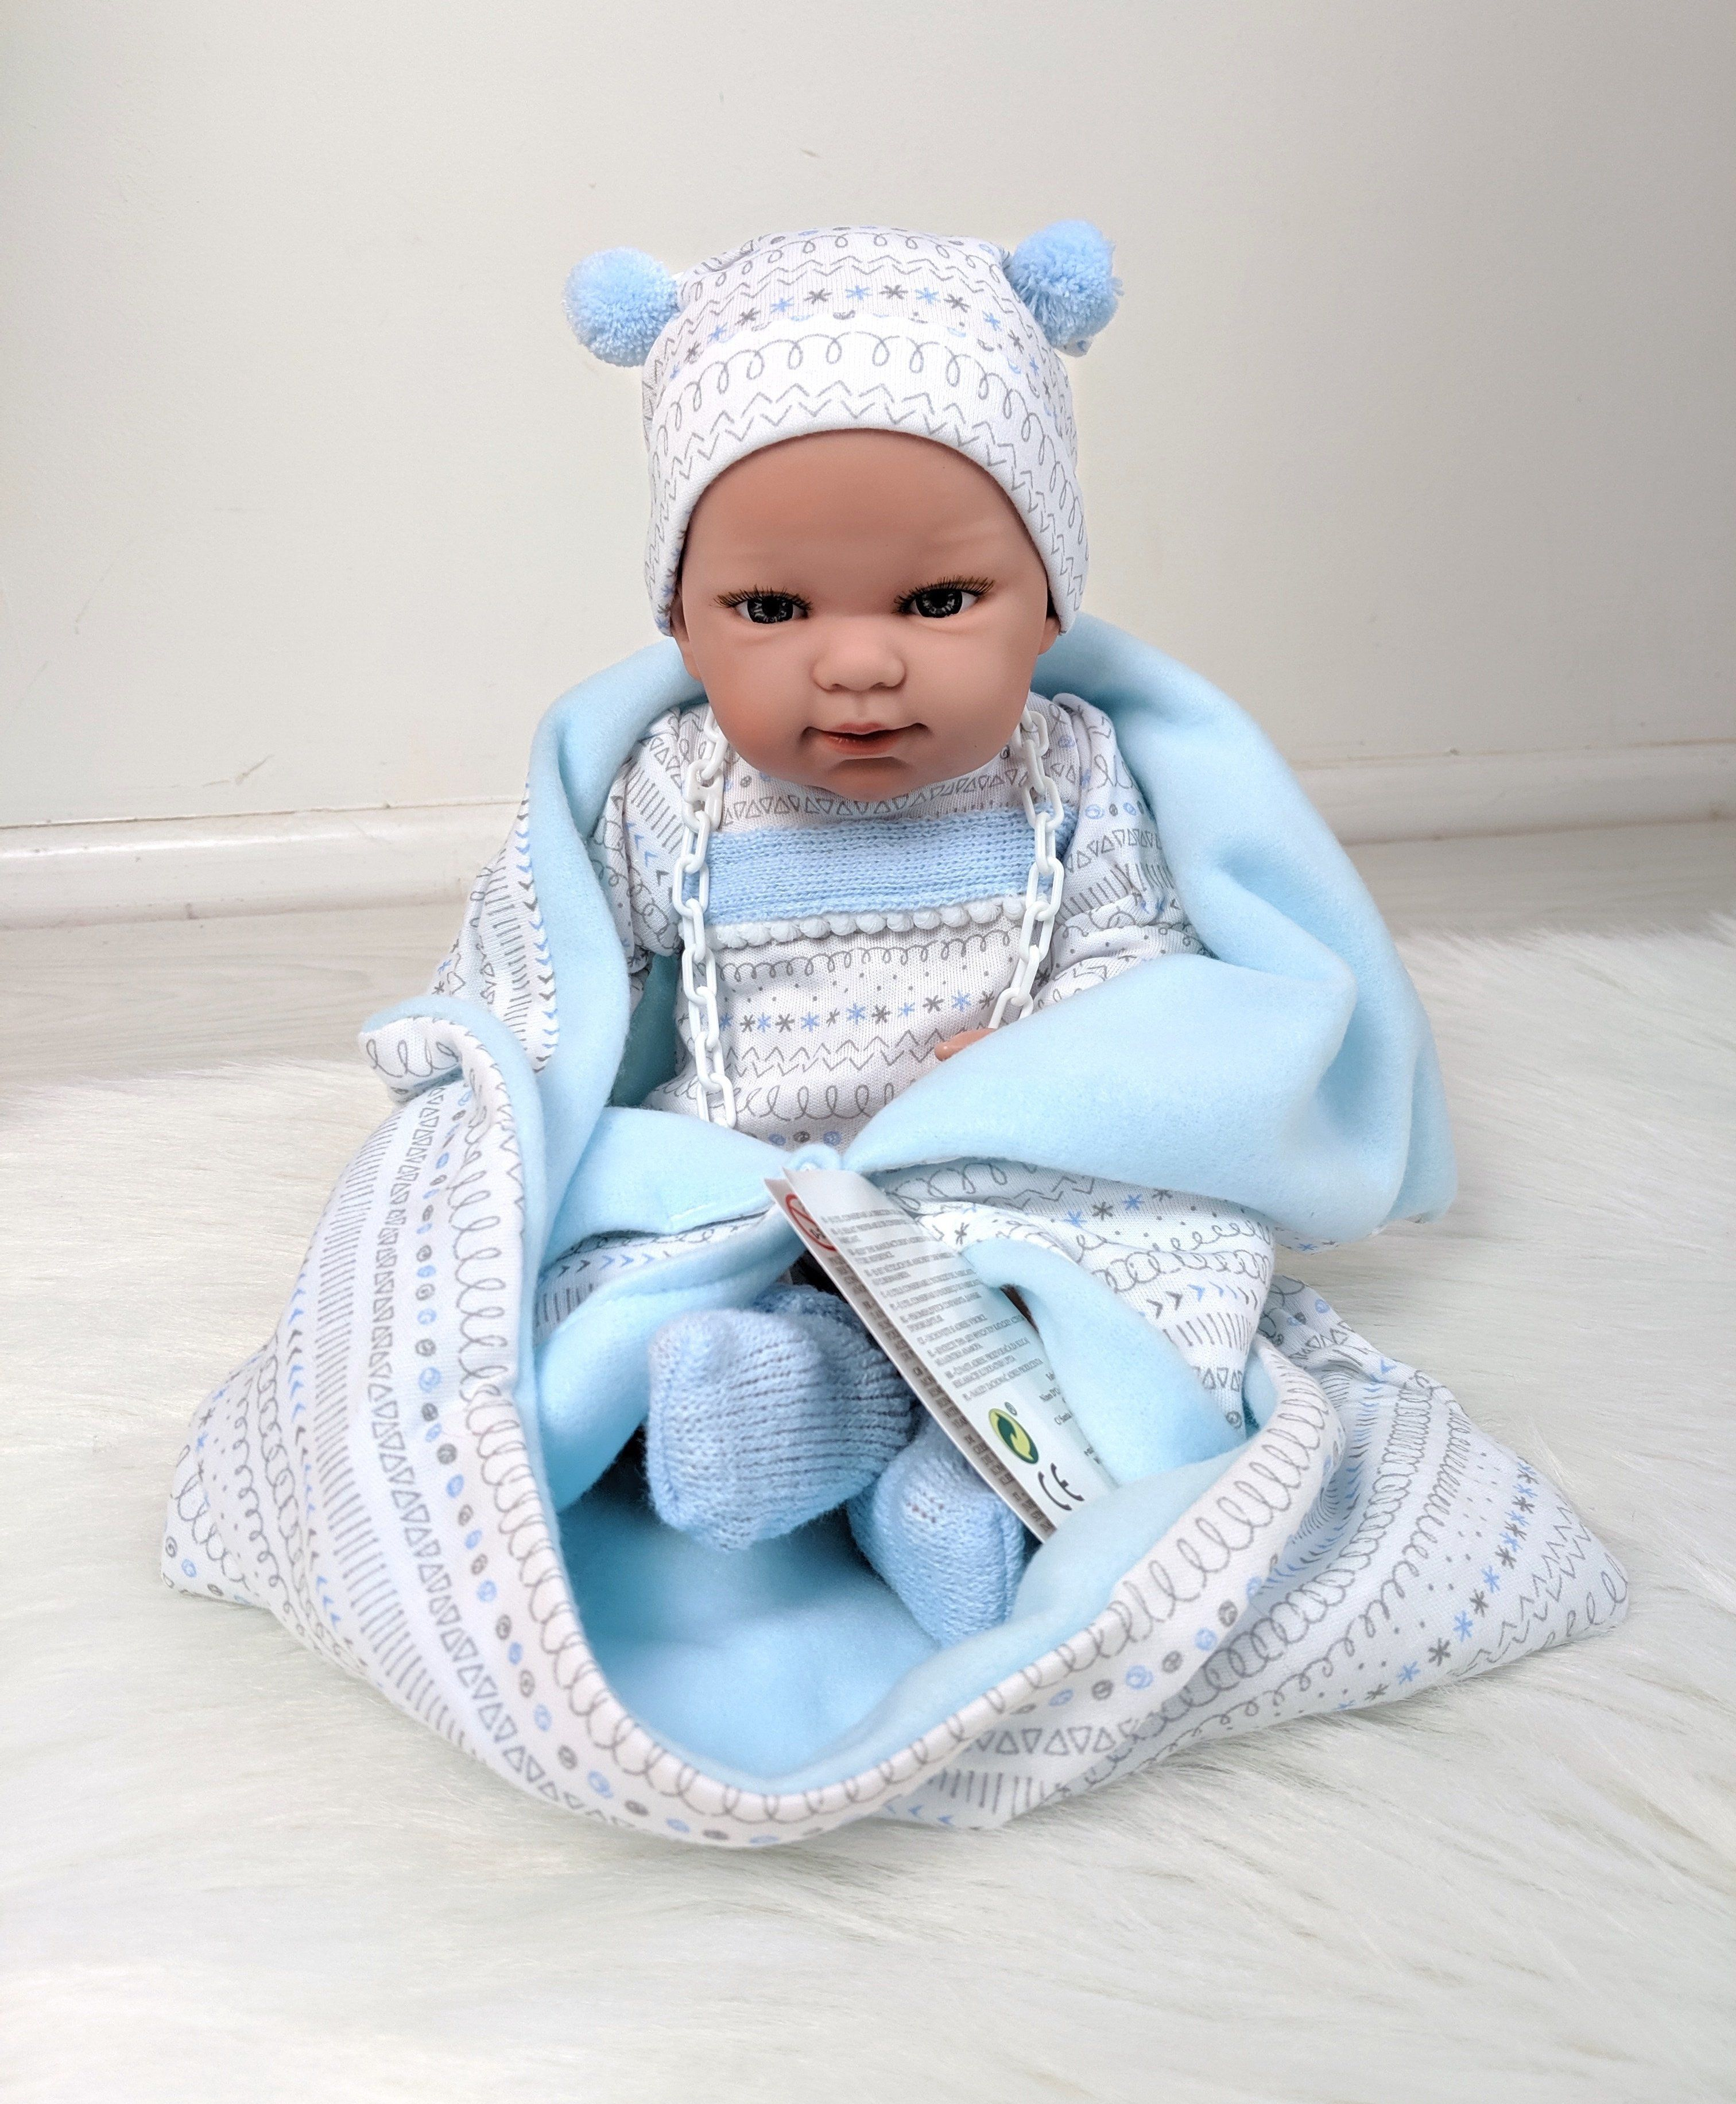 D'Nines Spanish Doll - Bobby #spanishdolls